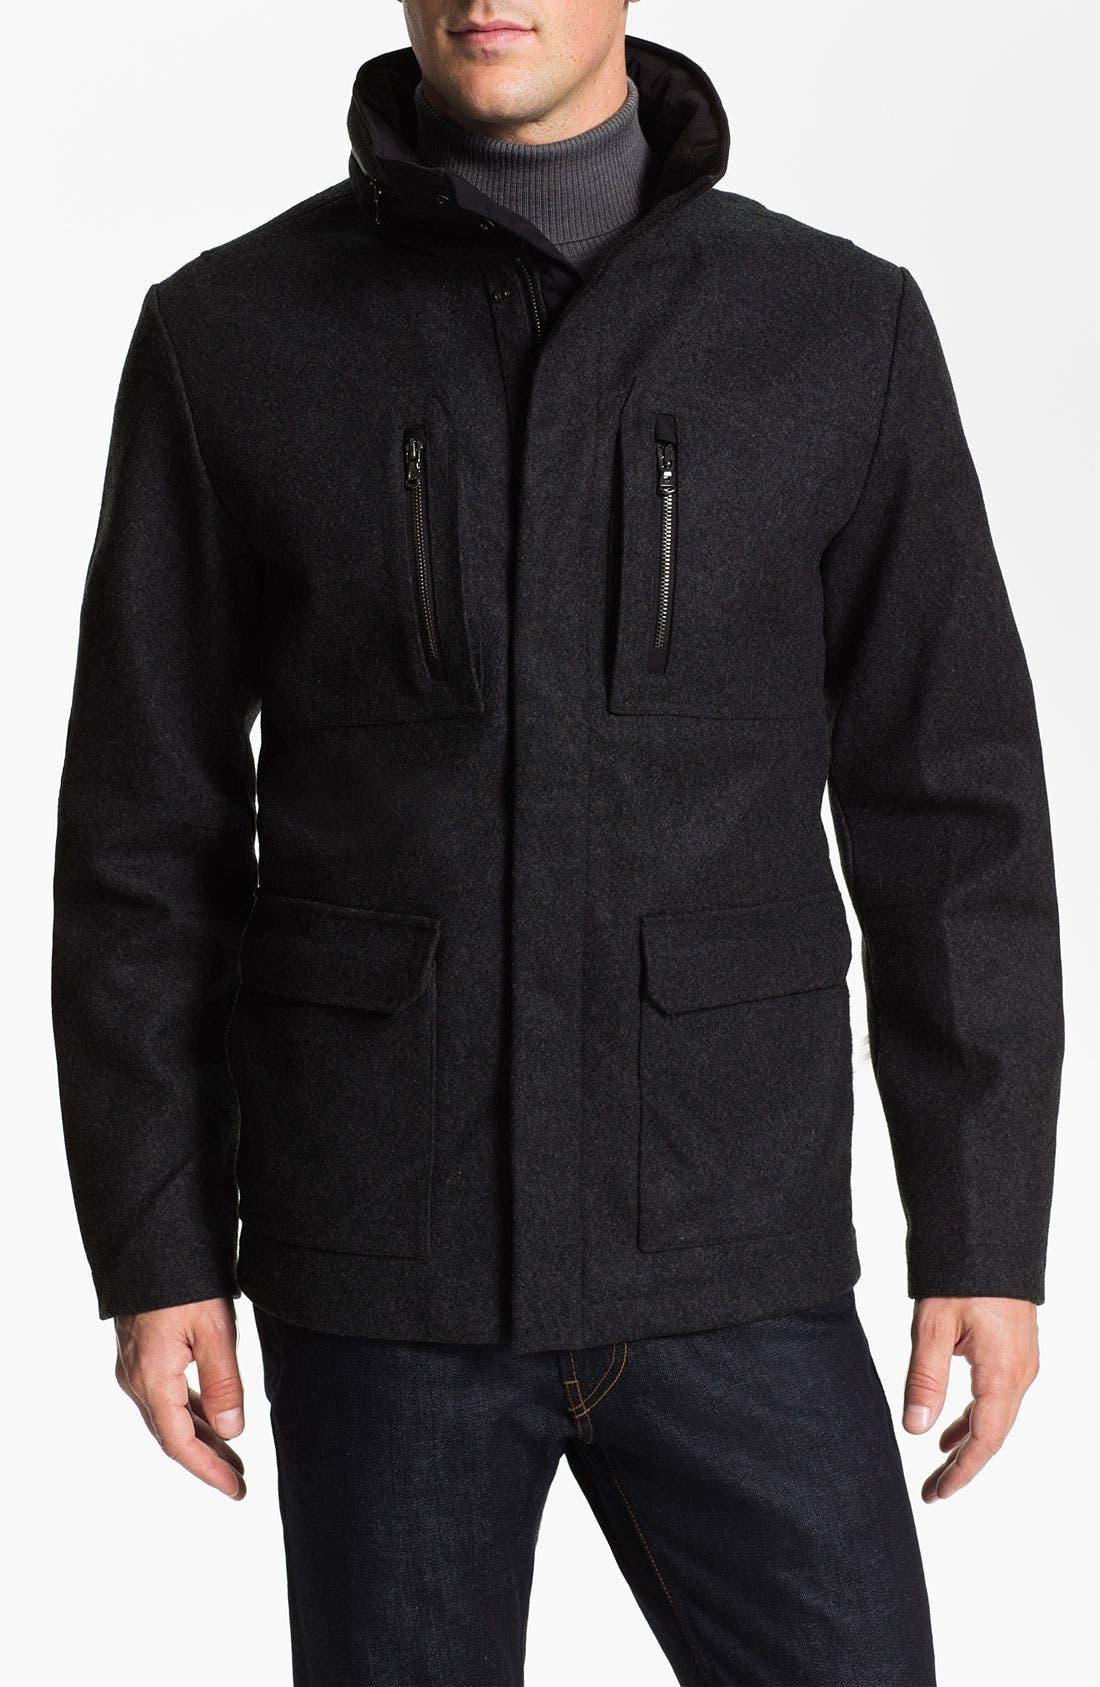 Alternate Image 1 Selected - Victorinox Swiss Army® 'Explorer' Wool Blend Jacket